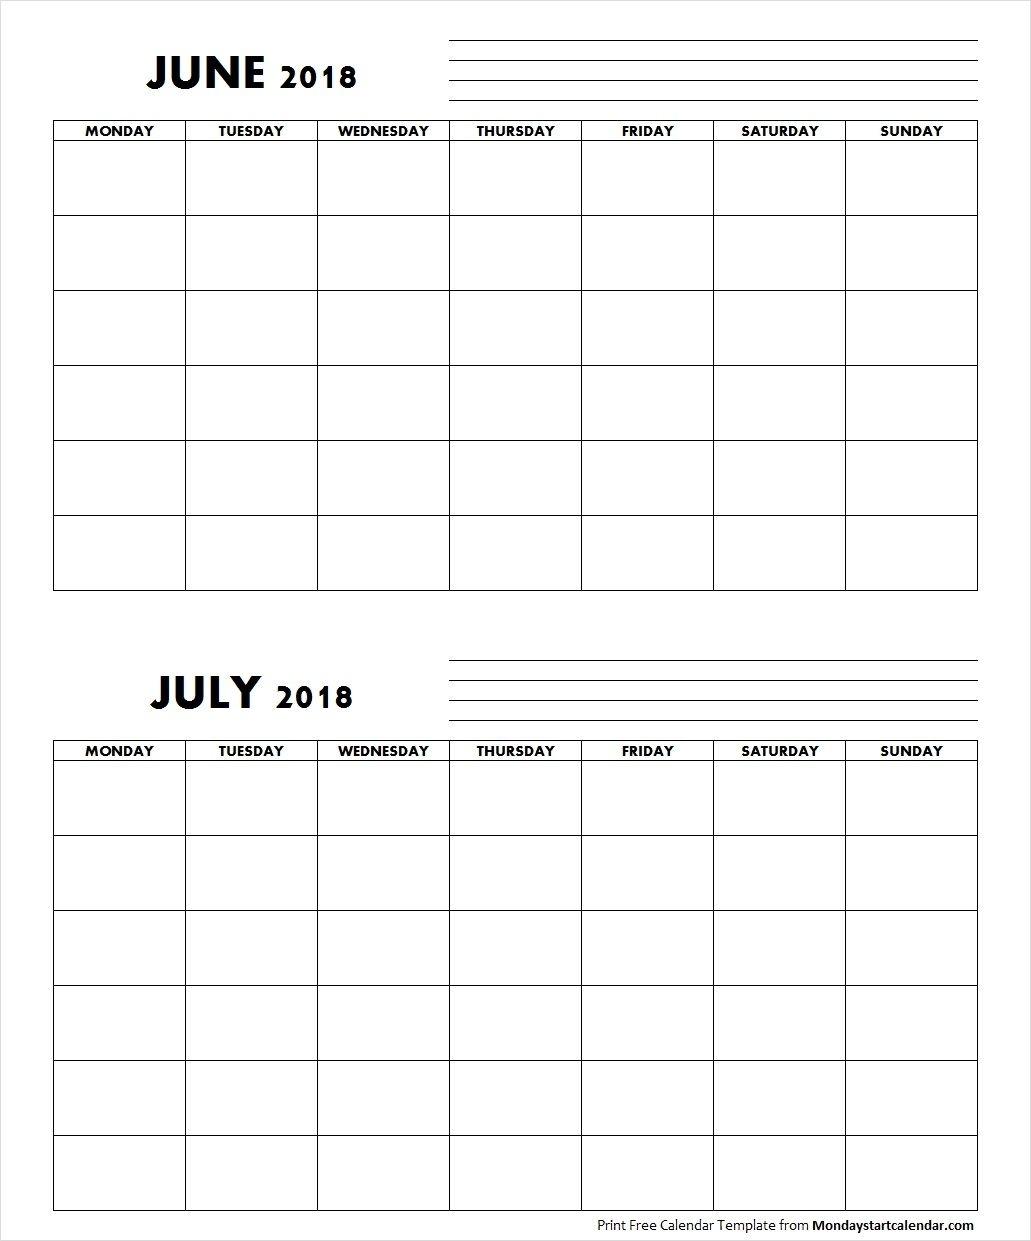 Blank June July 2018 Calendar Monday Start | Free Calendars To Print, Free Calendar Template